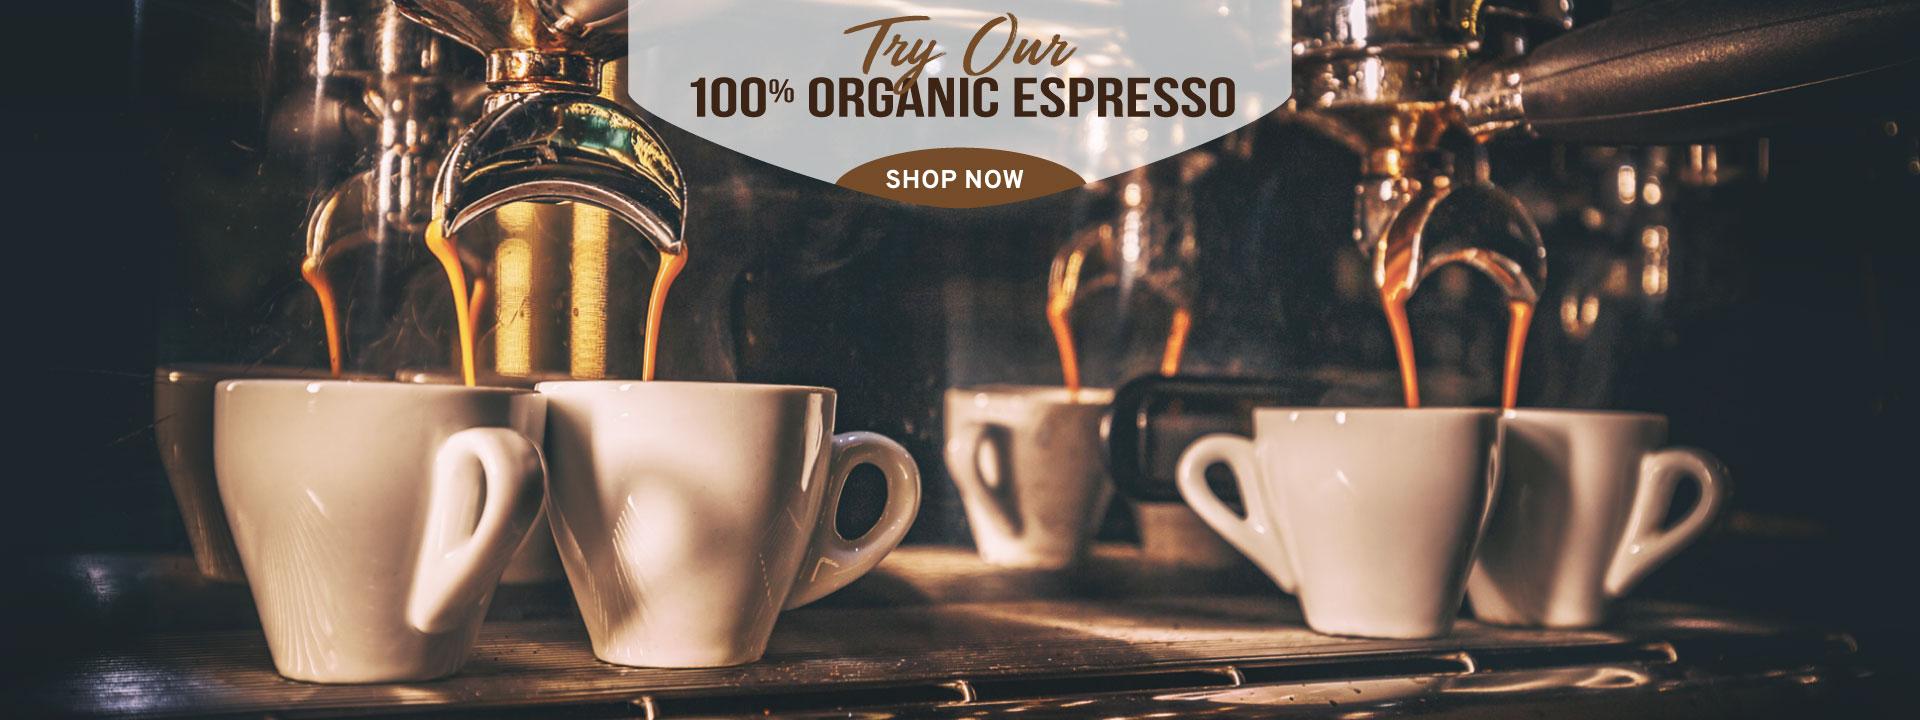 try-espresso